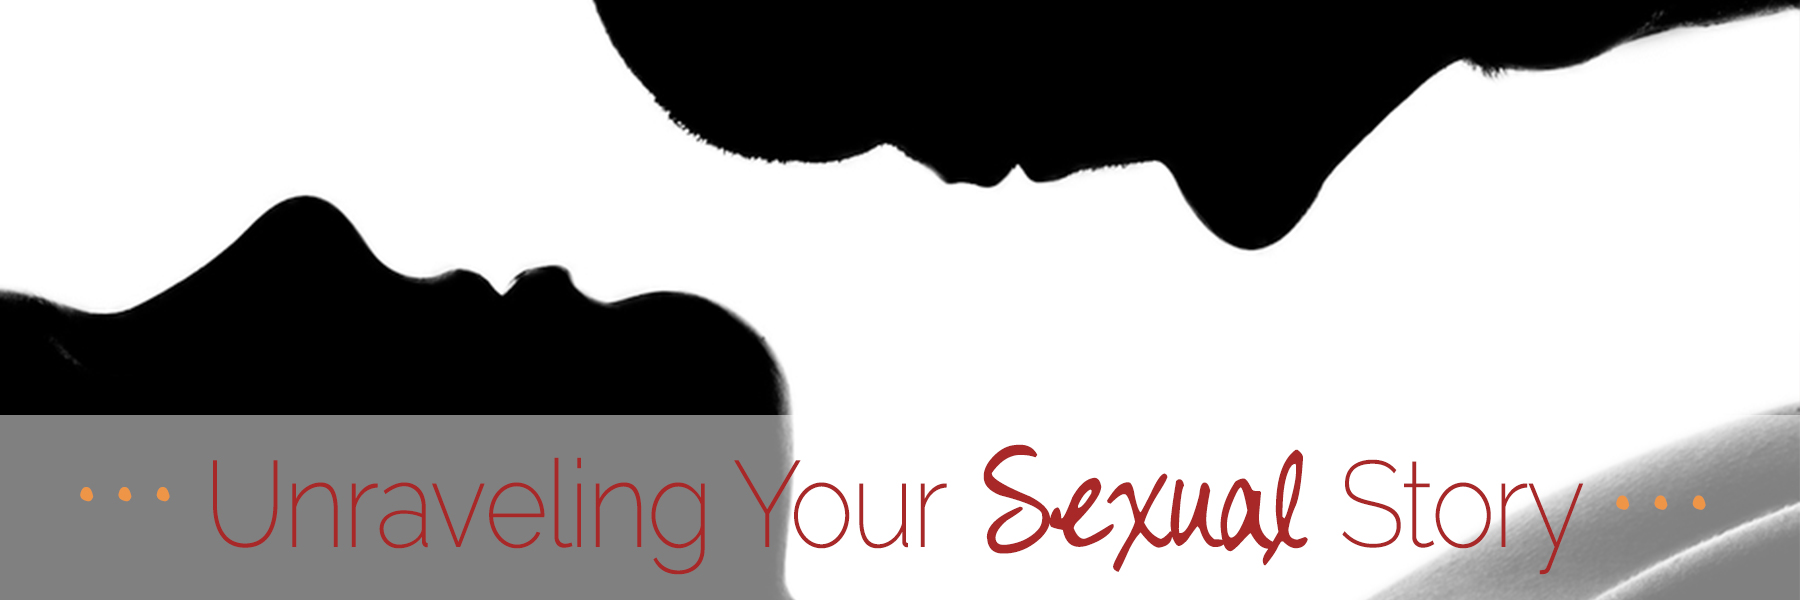 thriving-sex-header-week1